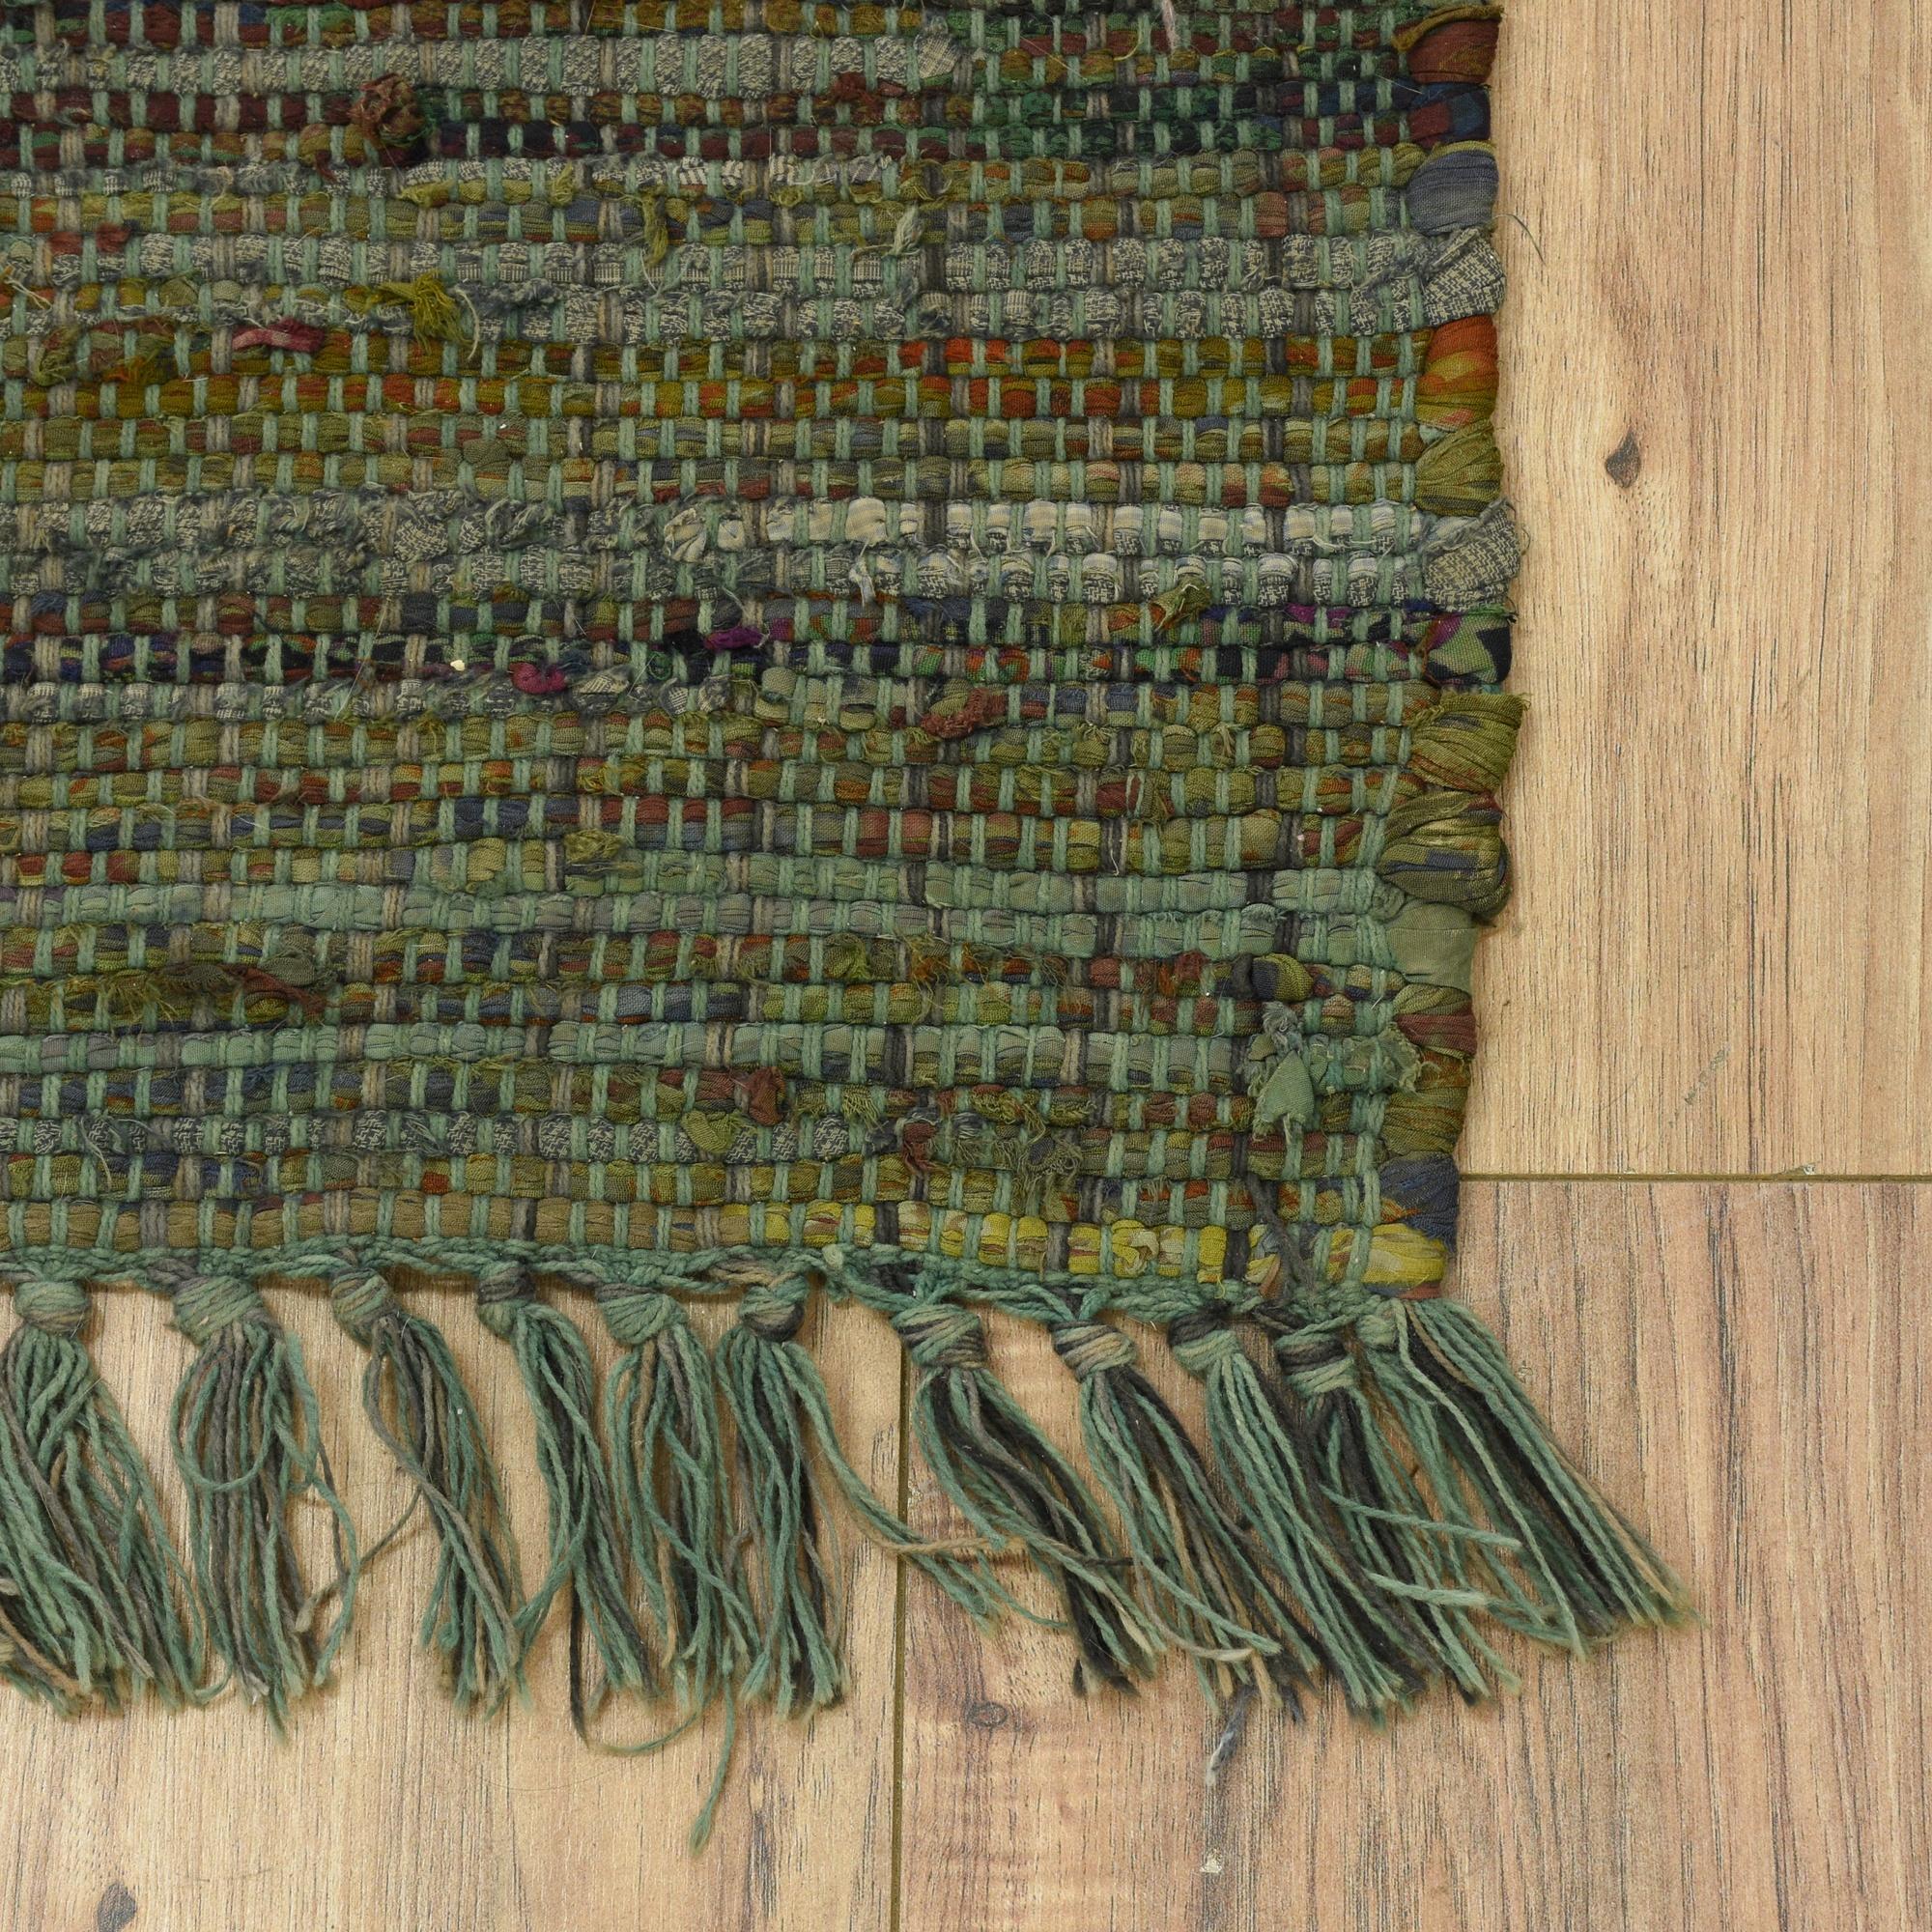 Rag Rug Large: Large Woven Blue Green Rag Rug